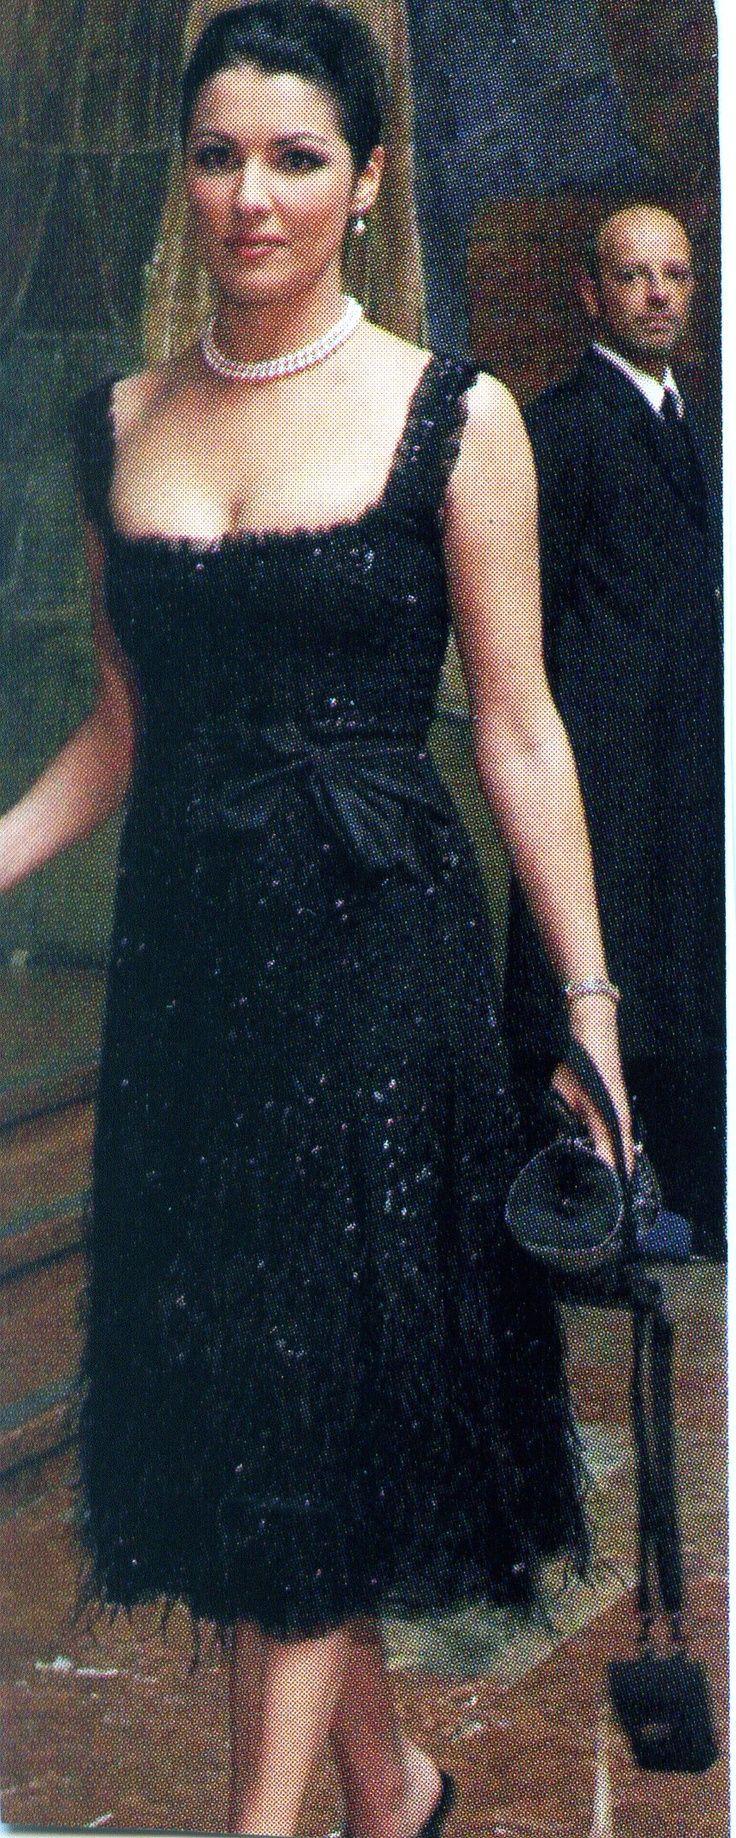 Anna Netrebko style | ... great black dress. I am slightly obsessed with Anna Netrebko's style